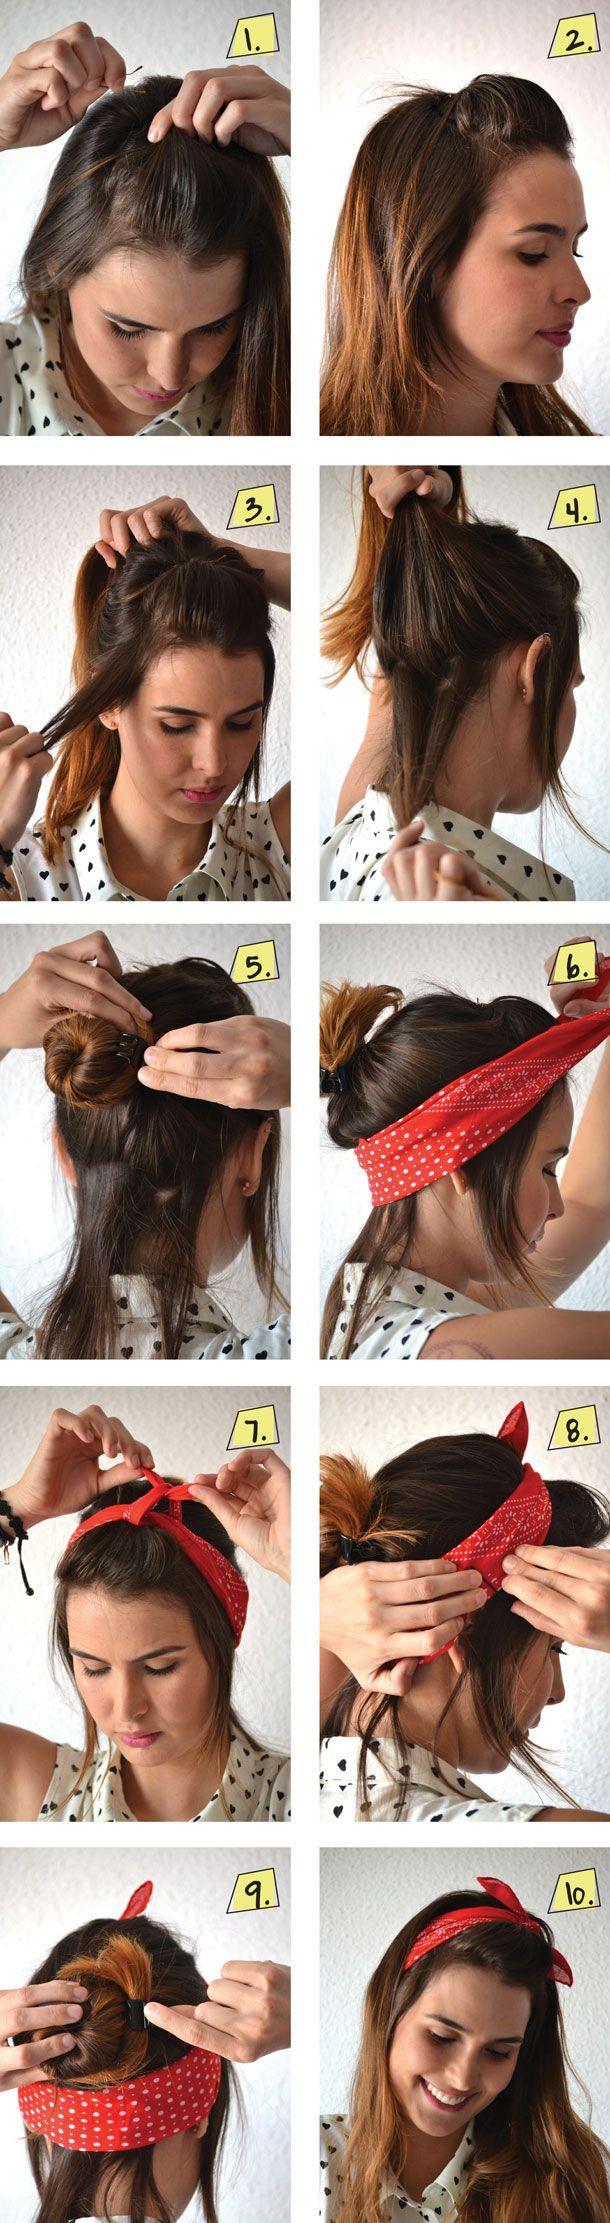 stilvolle Frisur offen Kopftuch Anleitung